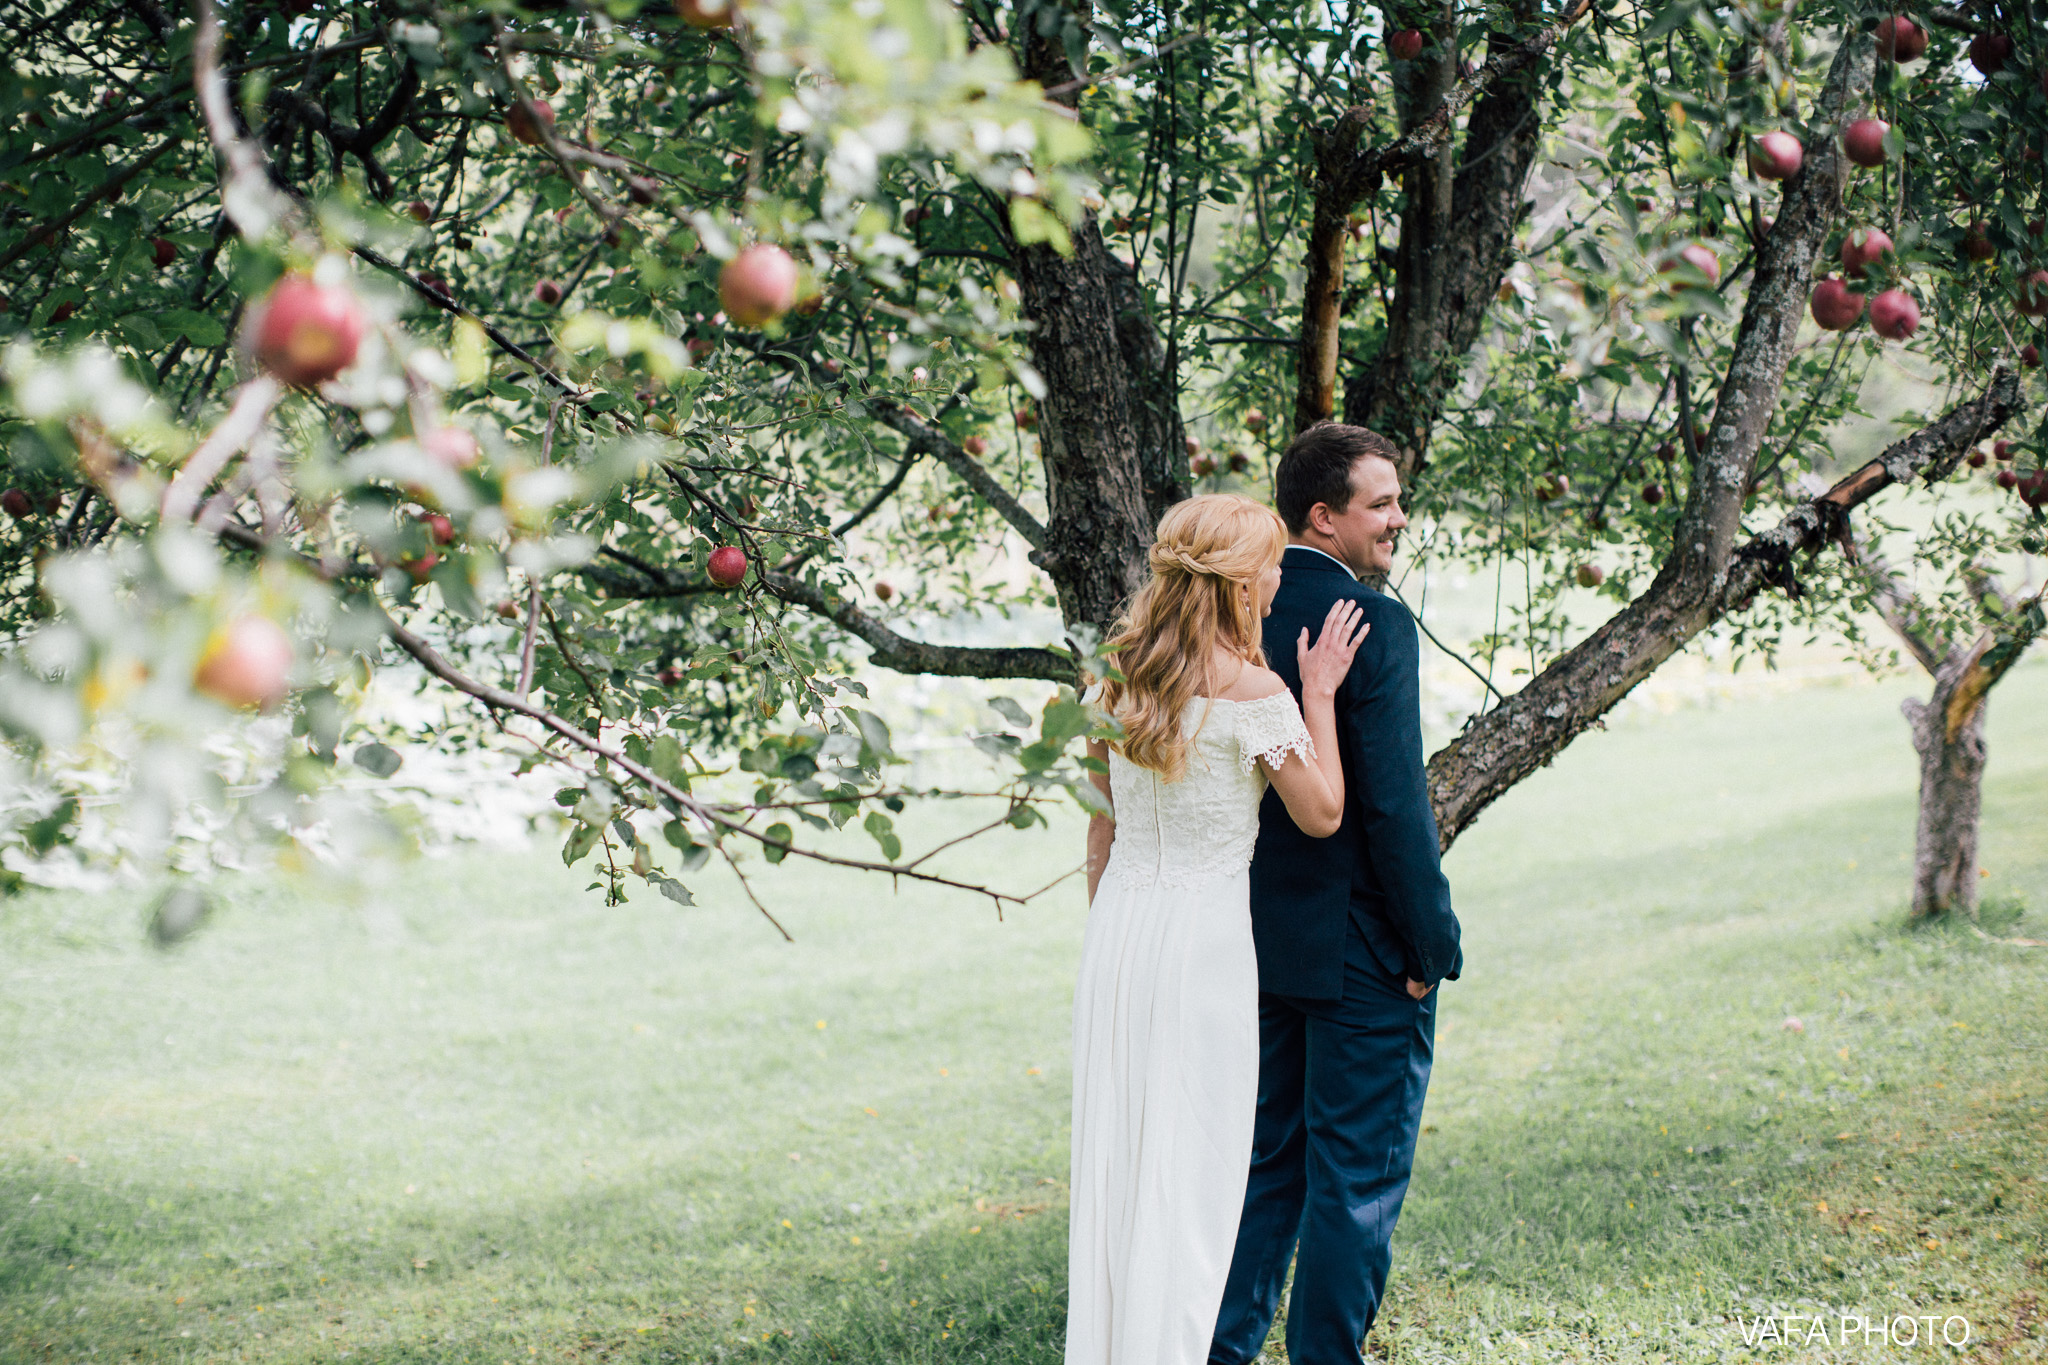 Belsolda-Farm-Wedding-Christy-Eric-Vafa-Photo-34.jpg